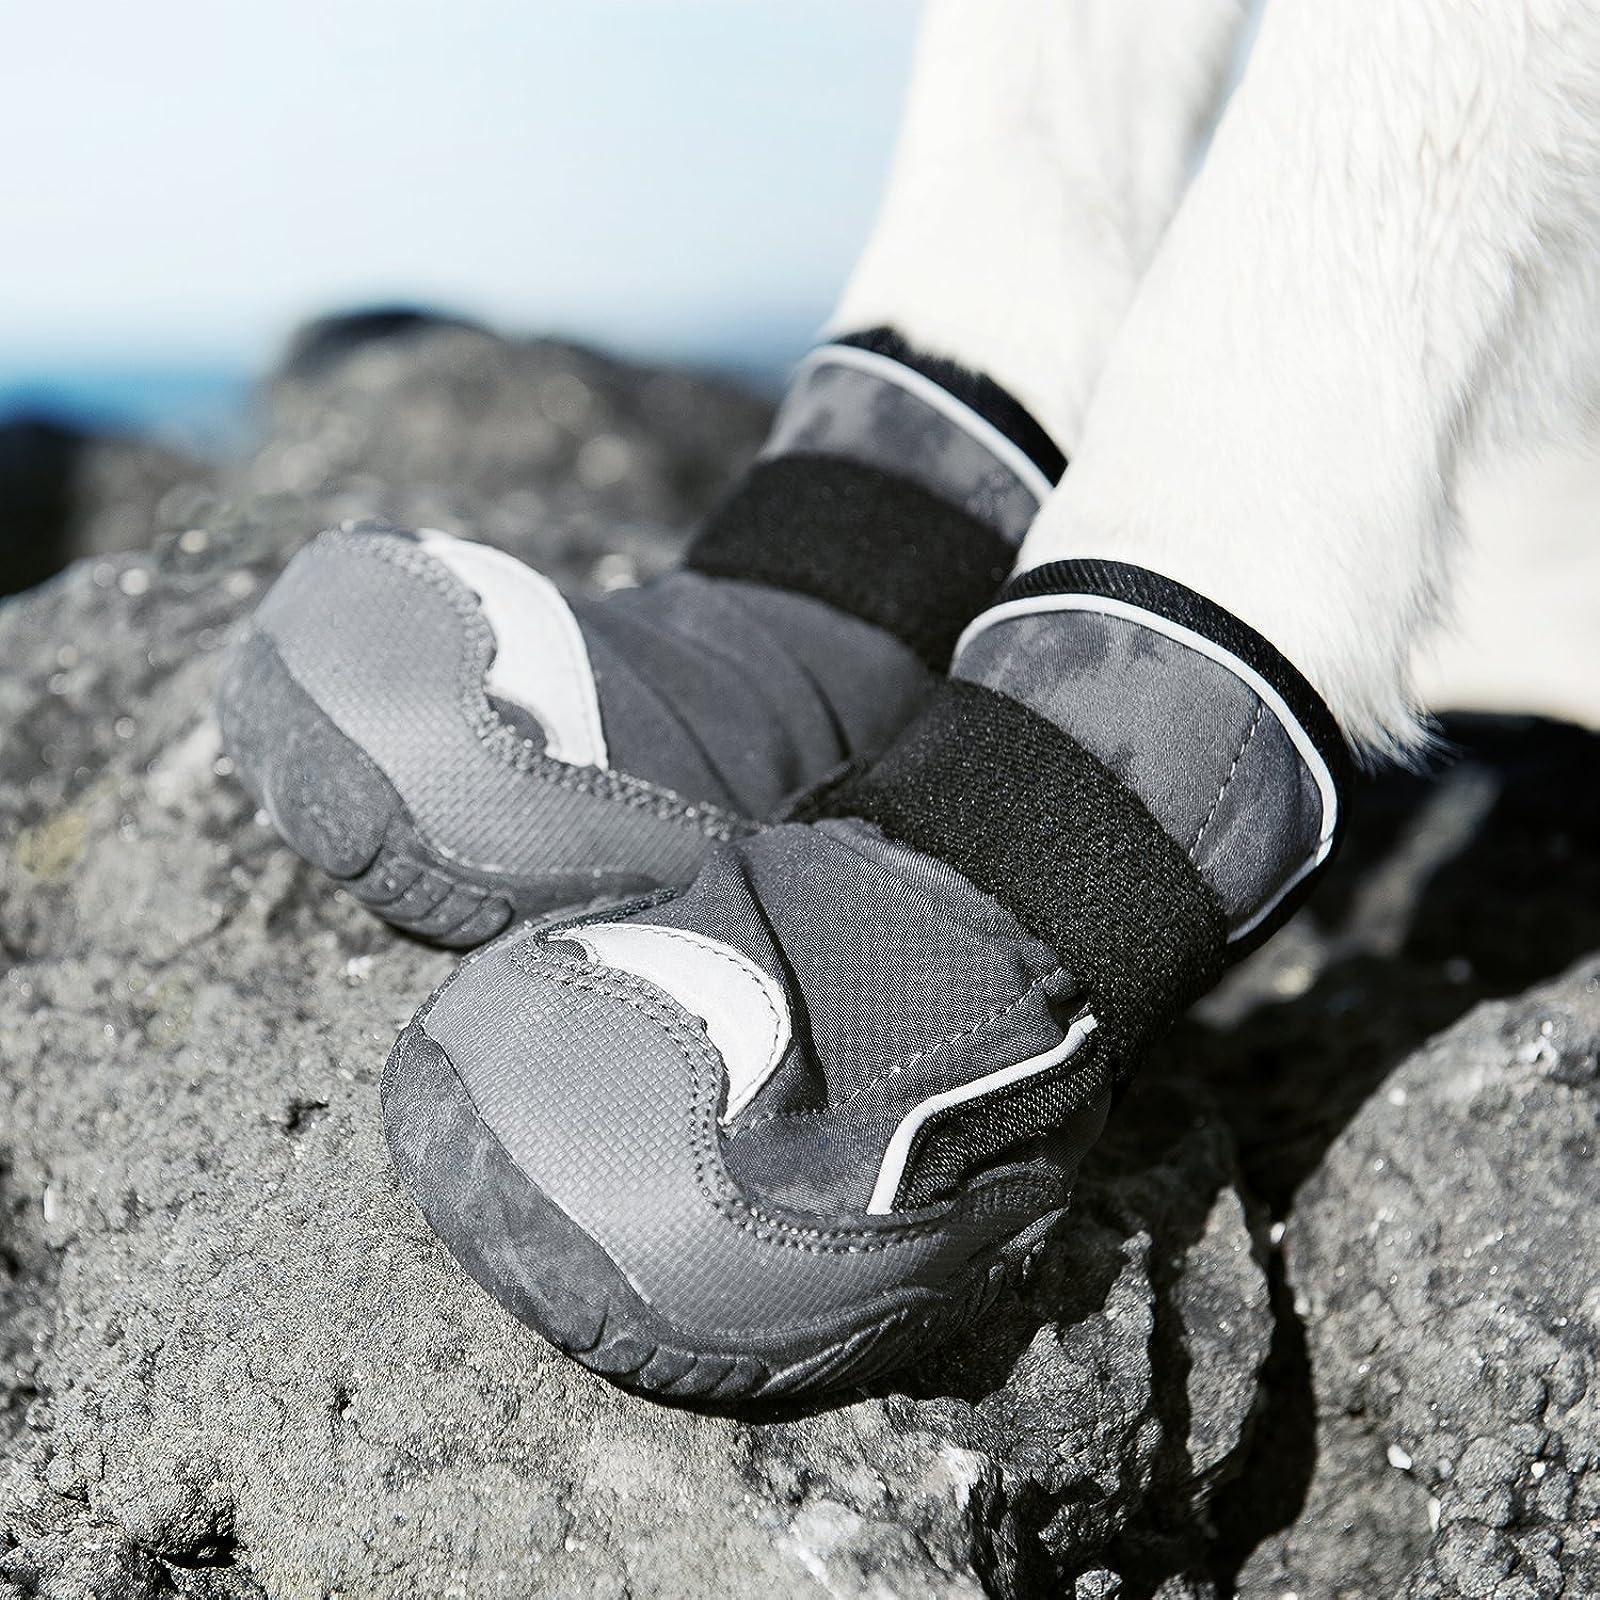 Hurtta Outback Dog Boots Granite 2 in 2 Pack HU932120 - 2